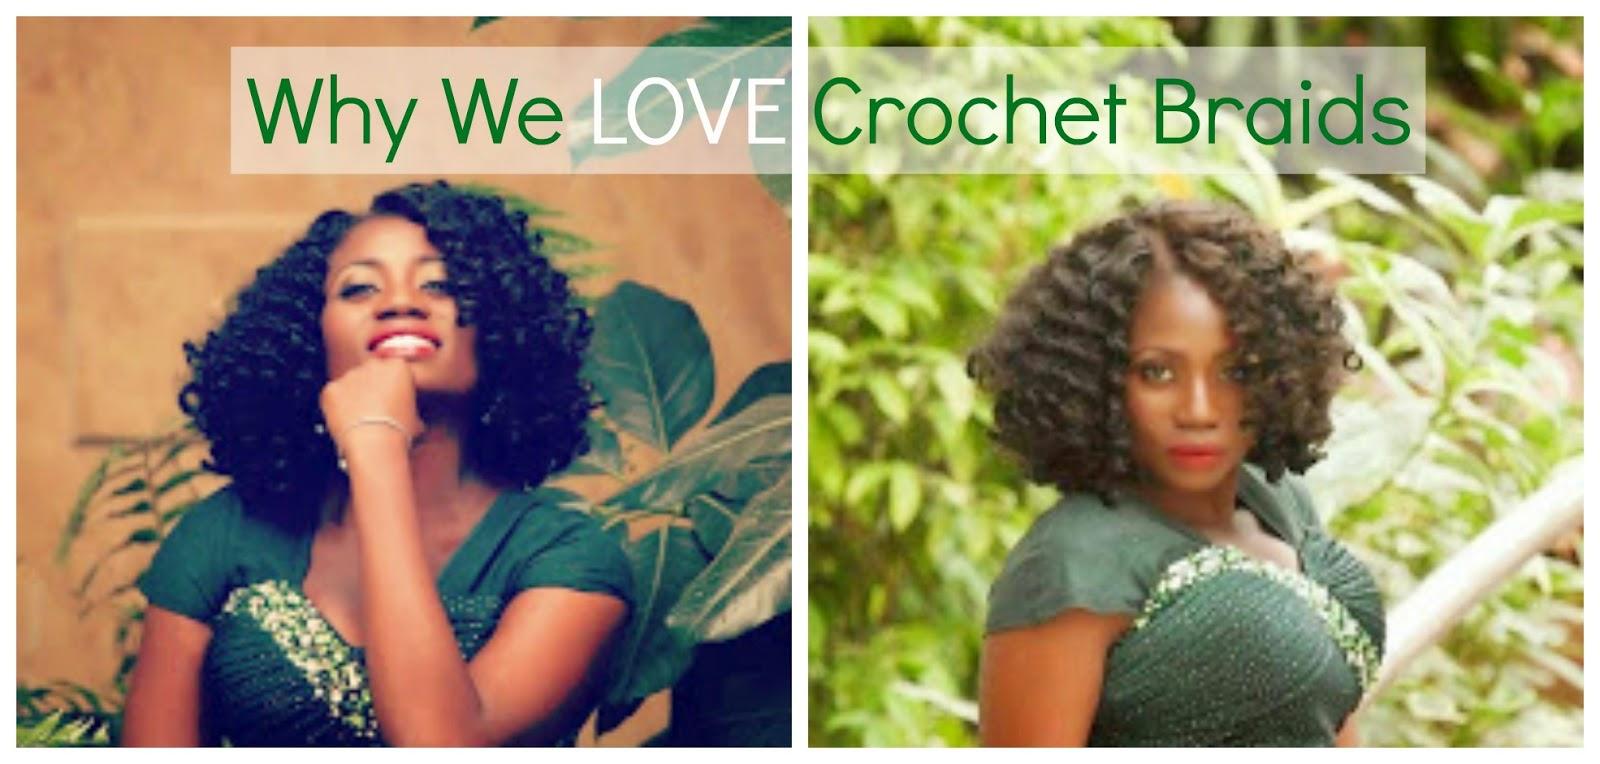 Why We LOVE Crochet Braids